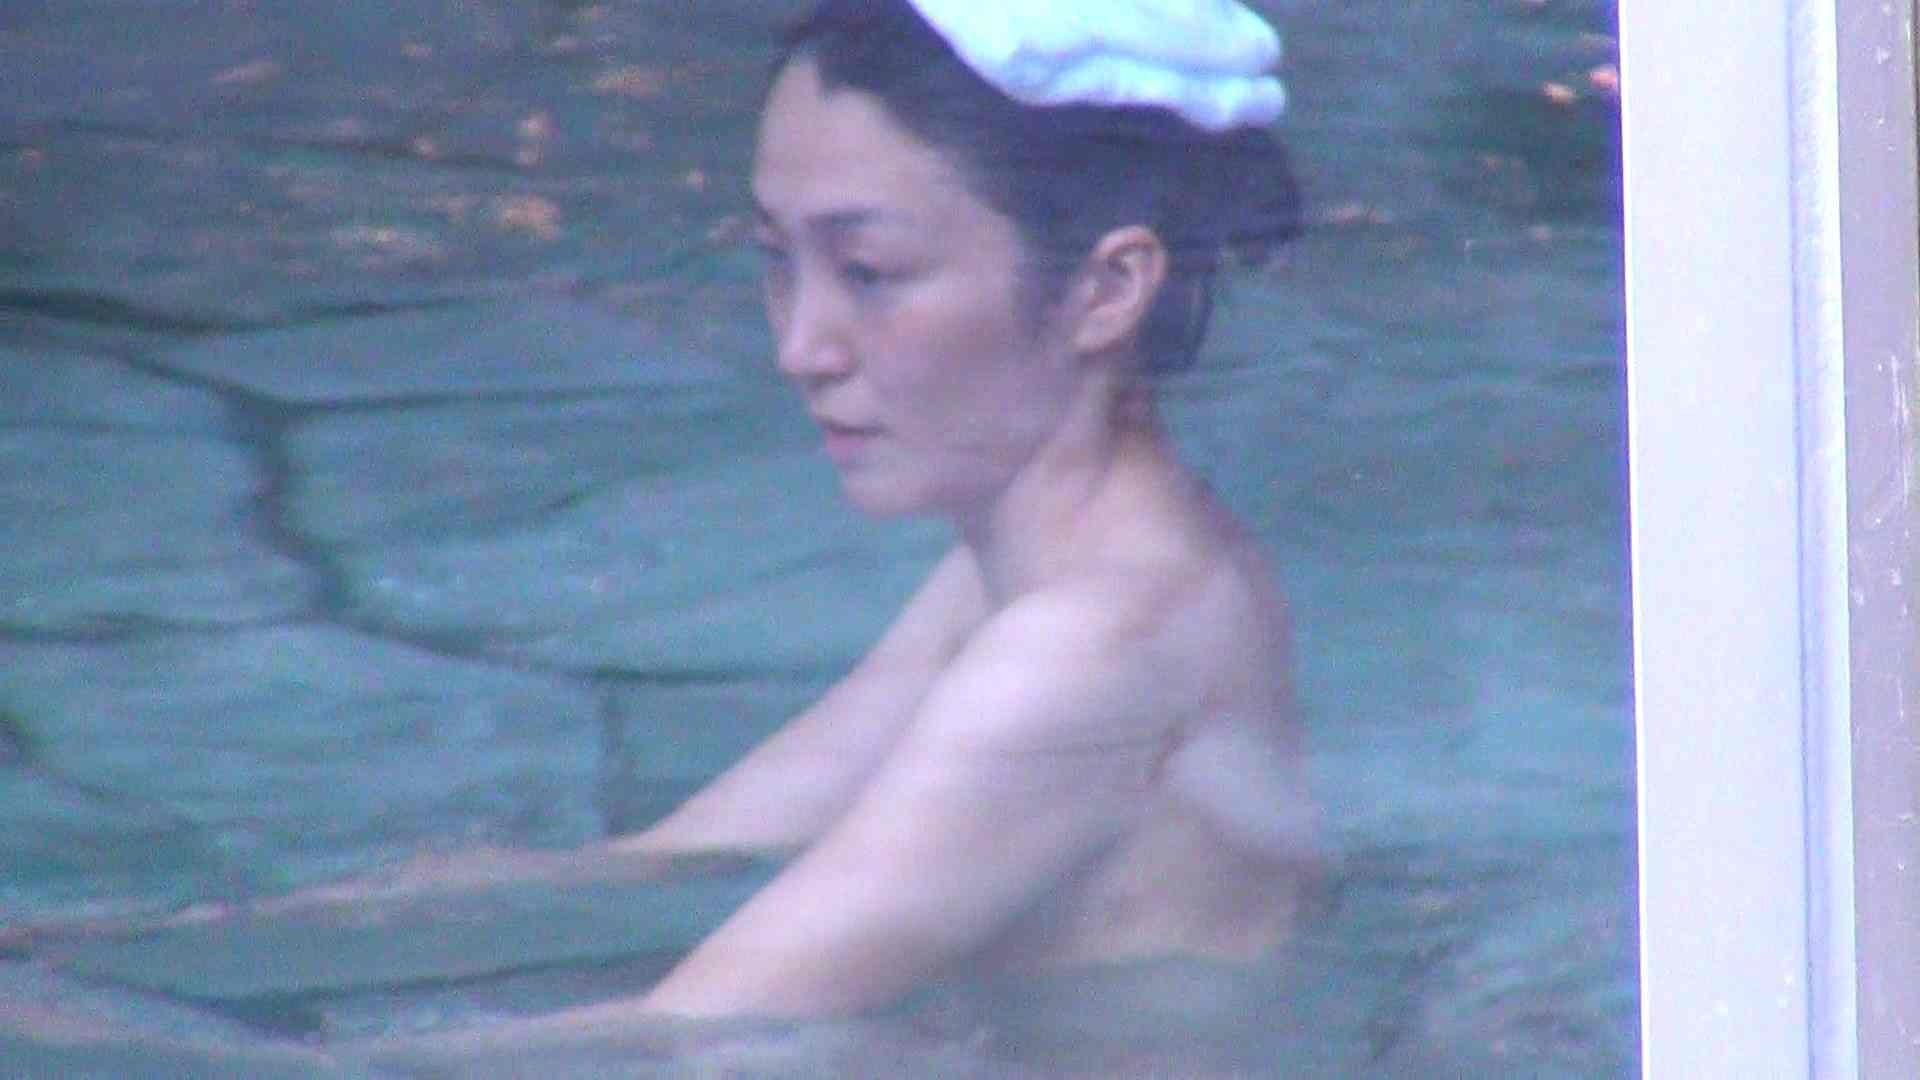 Aquaな露天風呂Vol.290 盗撮シリーズ | 露天風呂編  103PIX 17